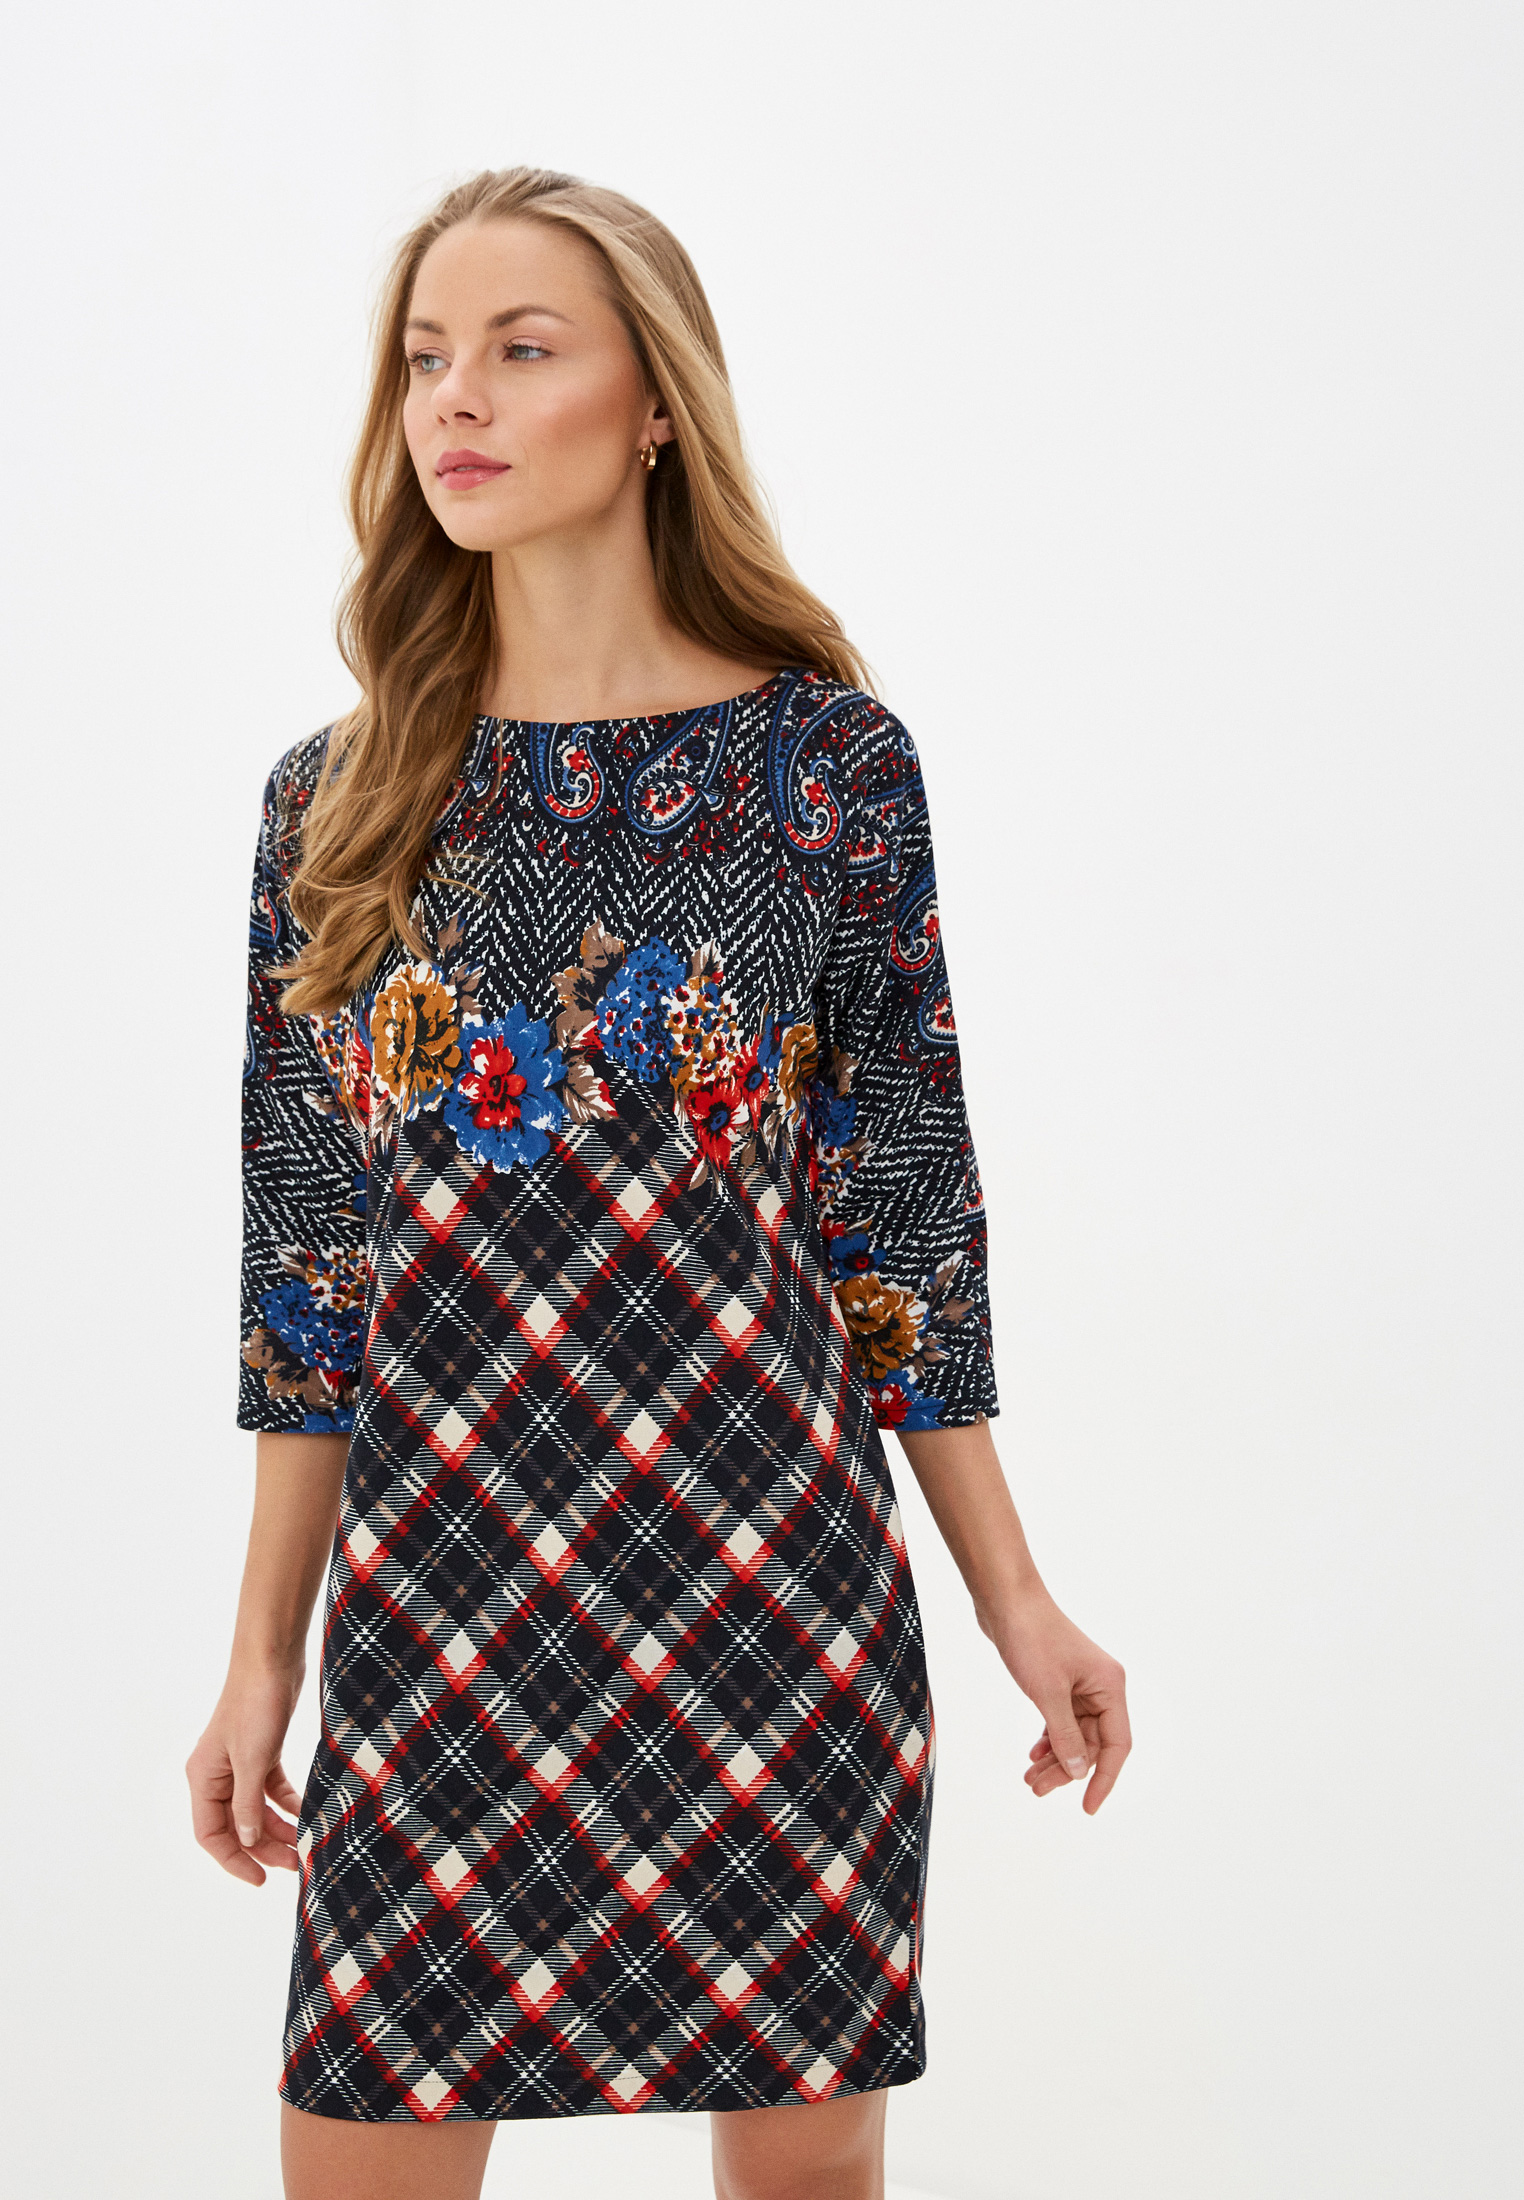 Платье A-A Awesome Apparel by Ksenia Avakyan купить за 1 293 ₽ в интернет-магазине Lamoda.ru